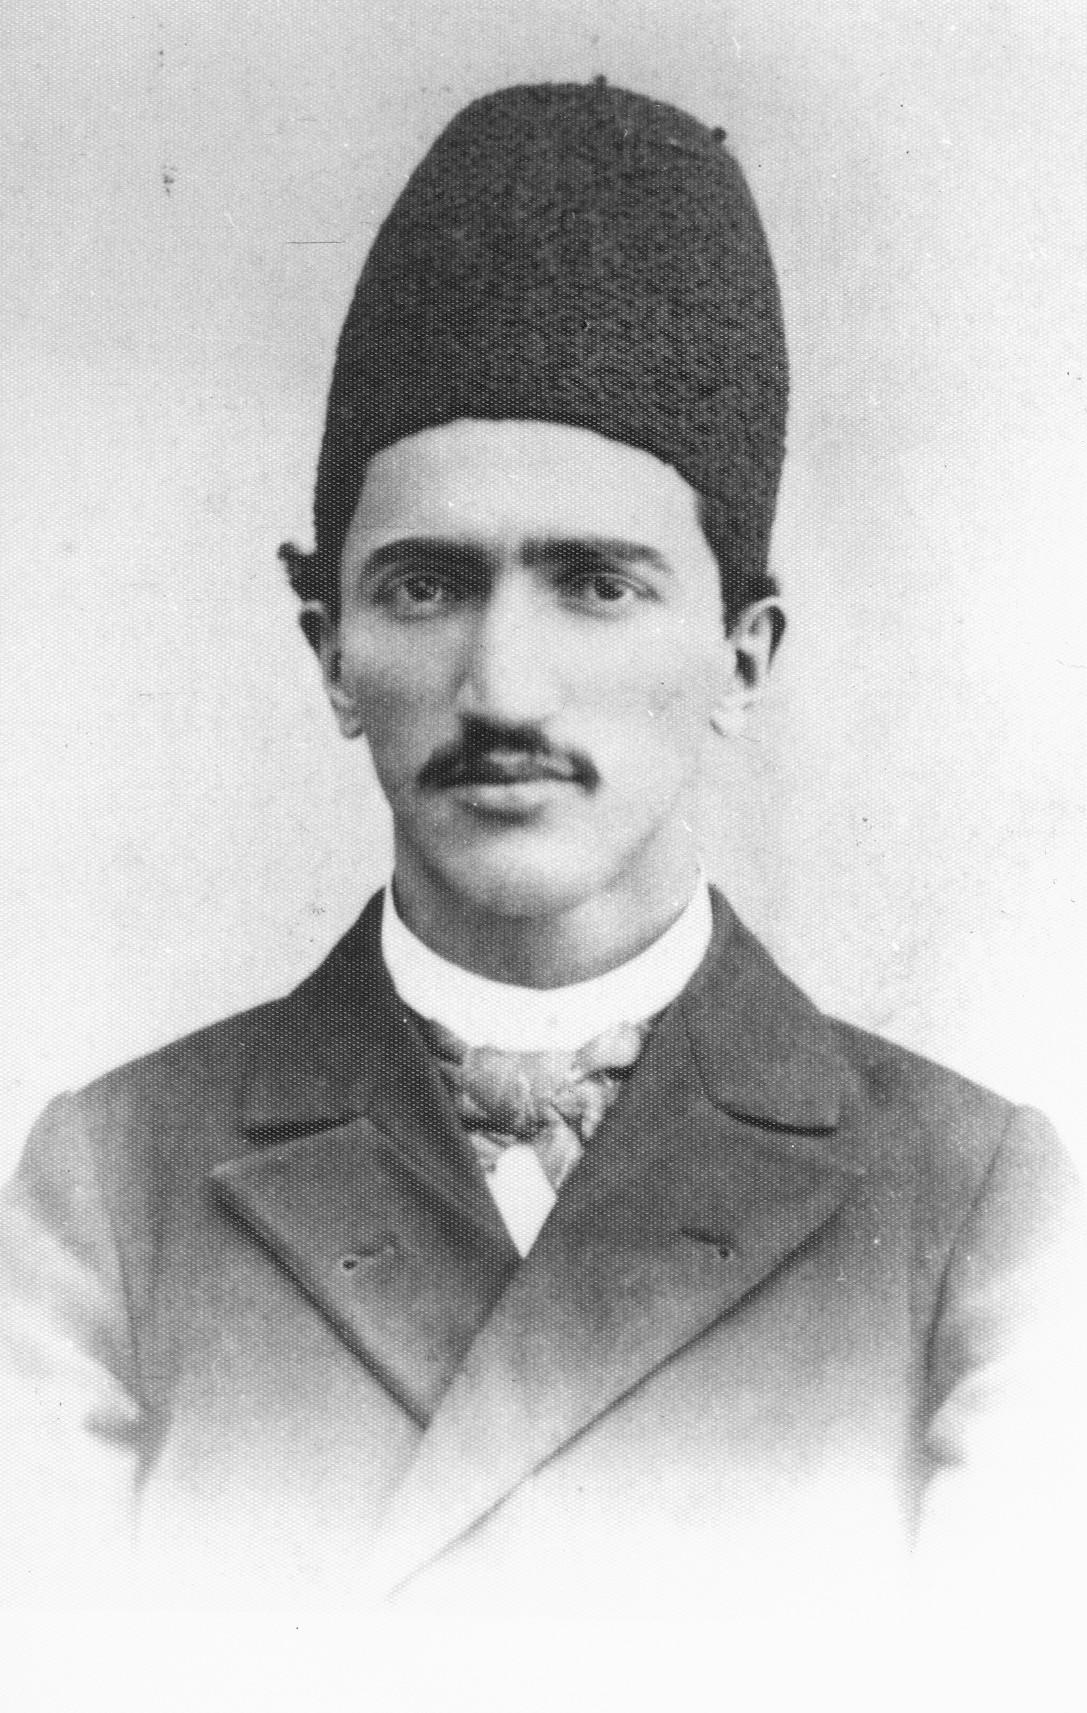 http://upload.wikimedia.org/wikipedia/commons/6/64/Yussef_Etessami.jpg